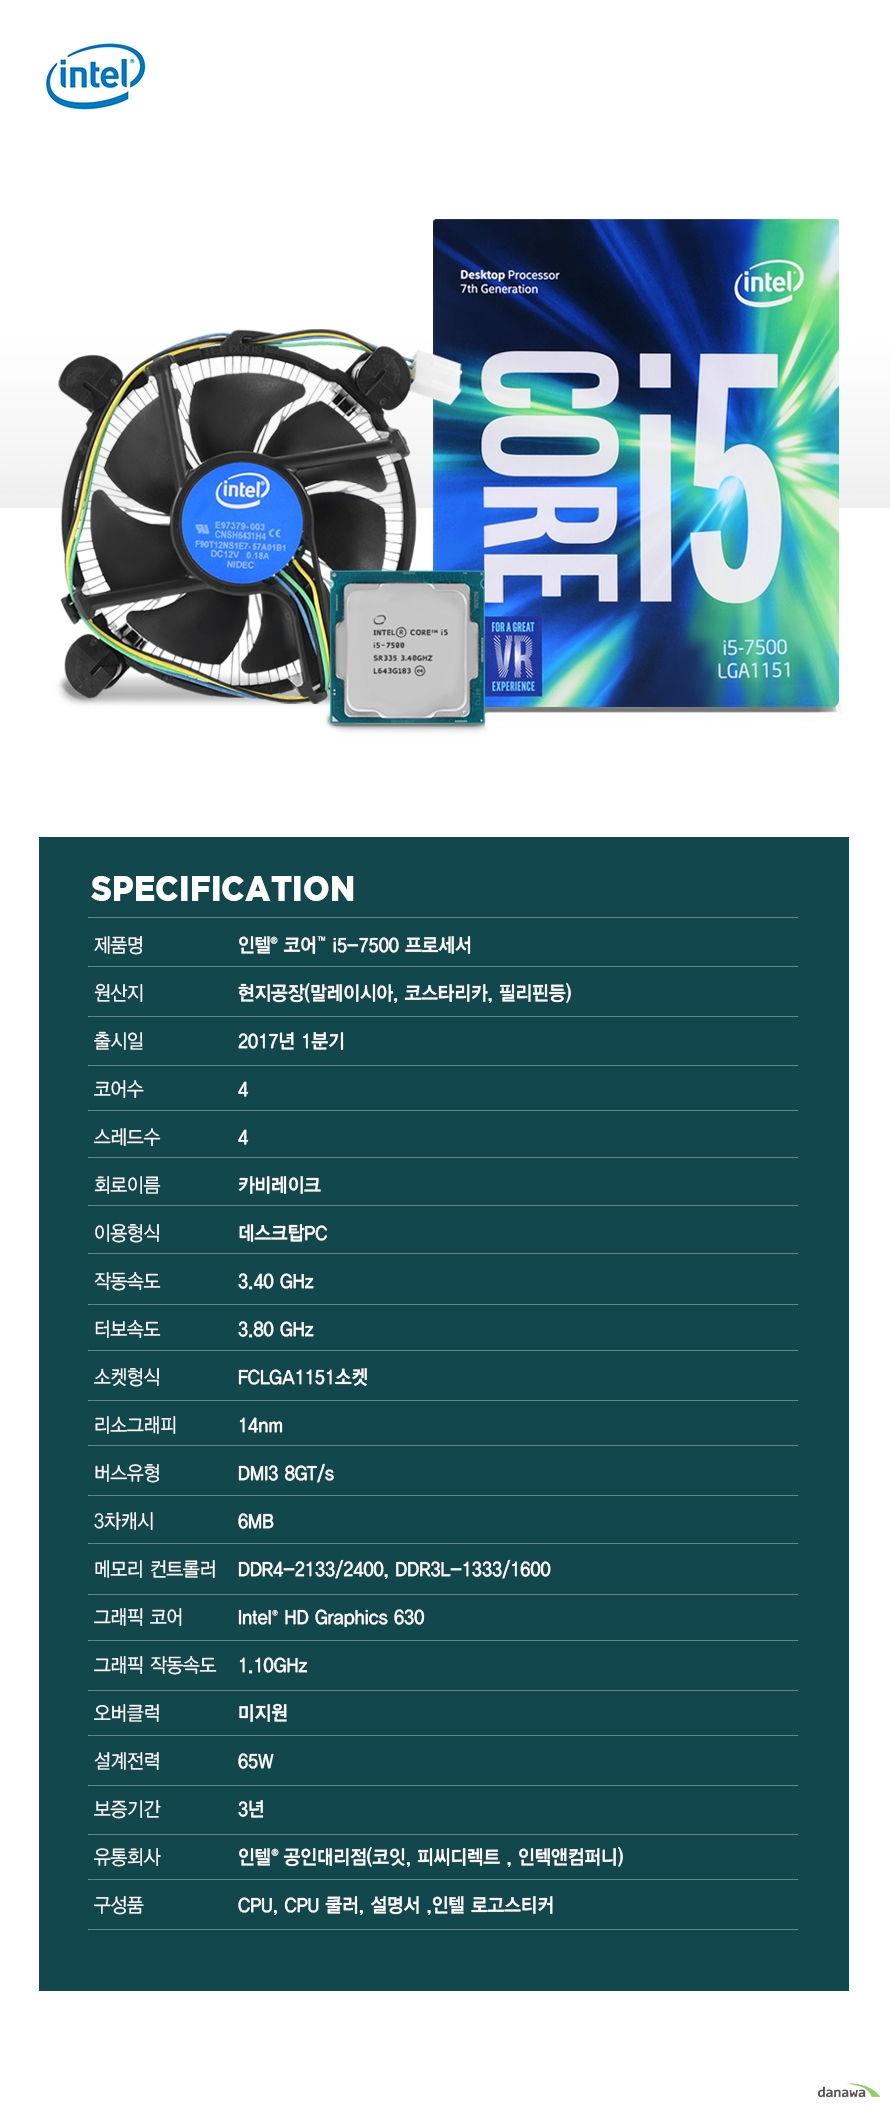 SPECIFICATION                제품명 인텔 코어 i5 - 7500 프로세서                        원산지 현지공장 말레이시아 코스타리카 필리핀등                출시일 2017년 1분기                코어수 4                스레드수 4                회로이름 카비레이크                이용형식 데스크탑PC                작동속도 3.40GHZ                터보속도 3.80GHZ                소켓형식 FCLGA1151소켓                리소그래피 14NM                버스유형 DMI3 8GT/S                3차캐시 6MB                메모리 컨트롤러 DDR4-2133/2400 DDR3L-1333/1600                그래픽 코어 INTEL HD GRAPHICS 630                그래픽 작동속도 1.10GHZ                오버클럭 미지원                설계전력 65W                보증기간 3년                유통회사 인텔 공인대리점 코잇 피씨디렉트 인텍엔 컴퍼니                구성품 CPU CPU쿨러 설명서 인텔 로고스티커